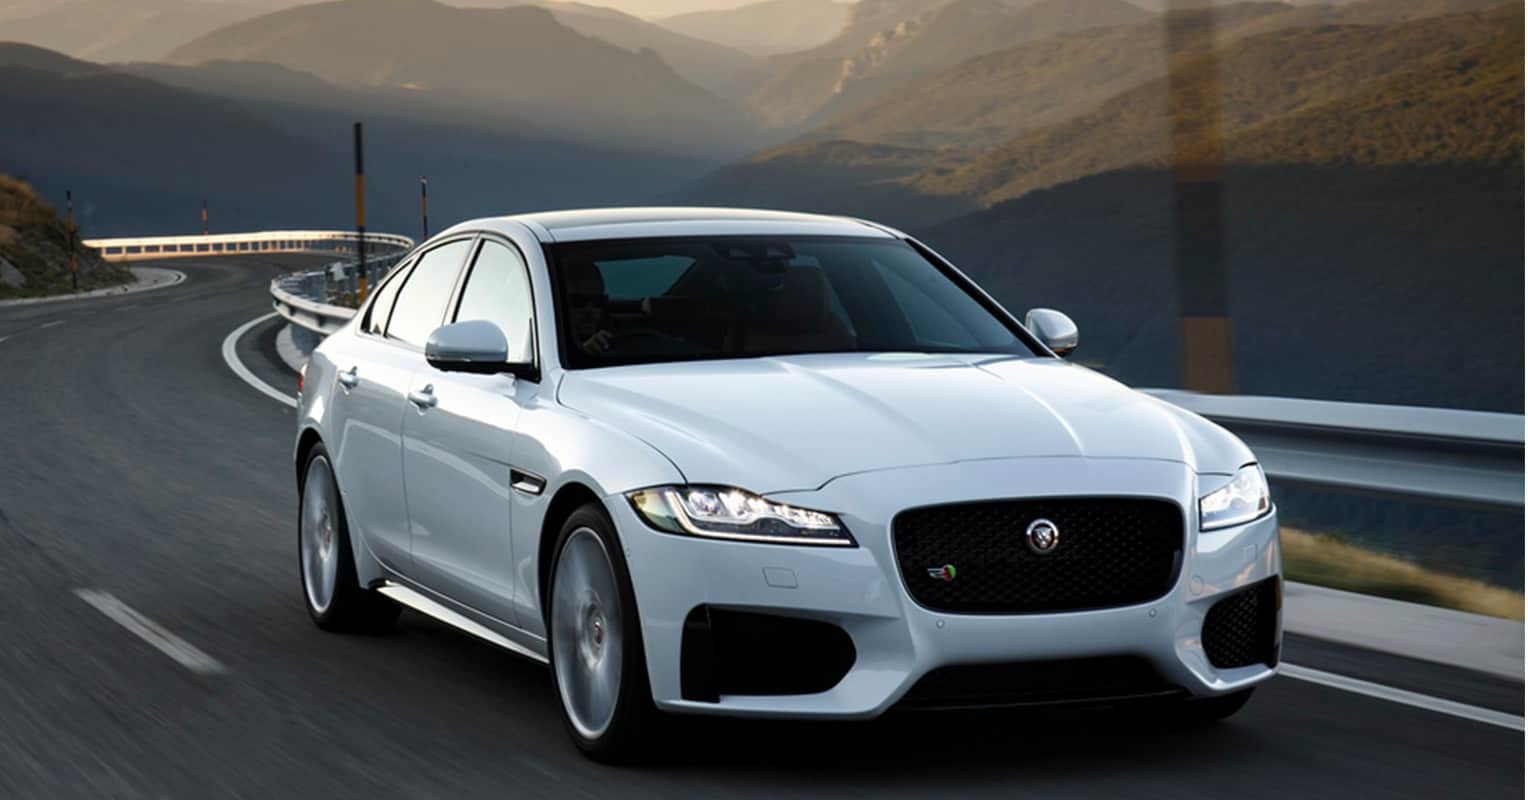 Jaguar XF frontal